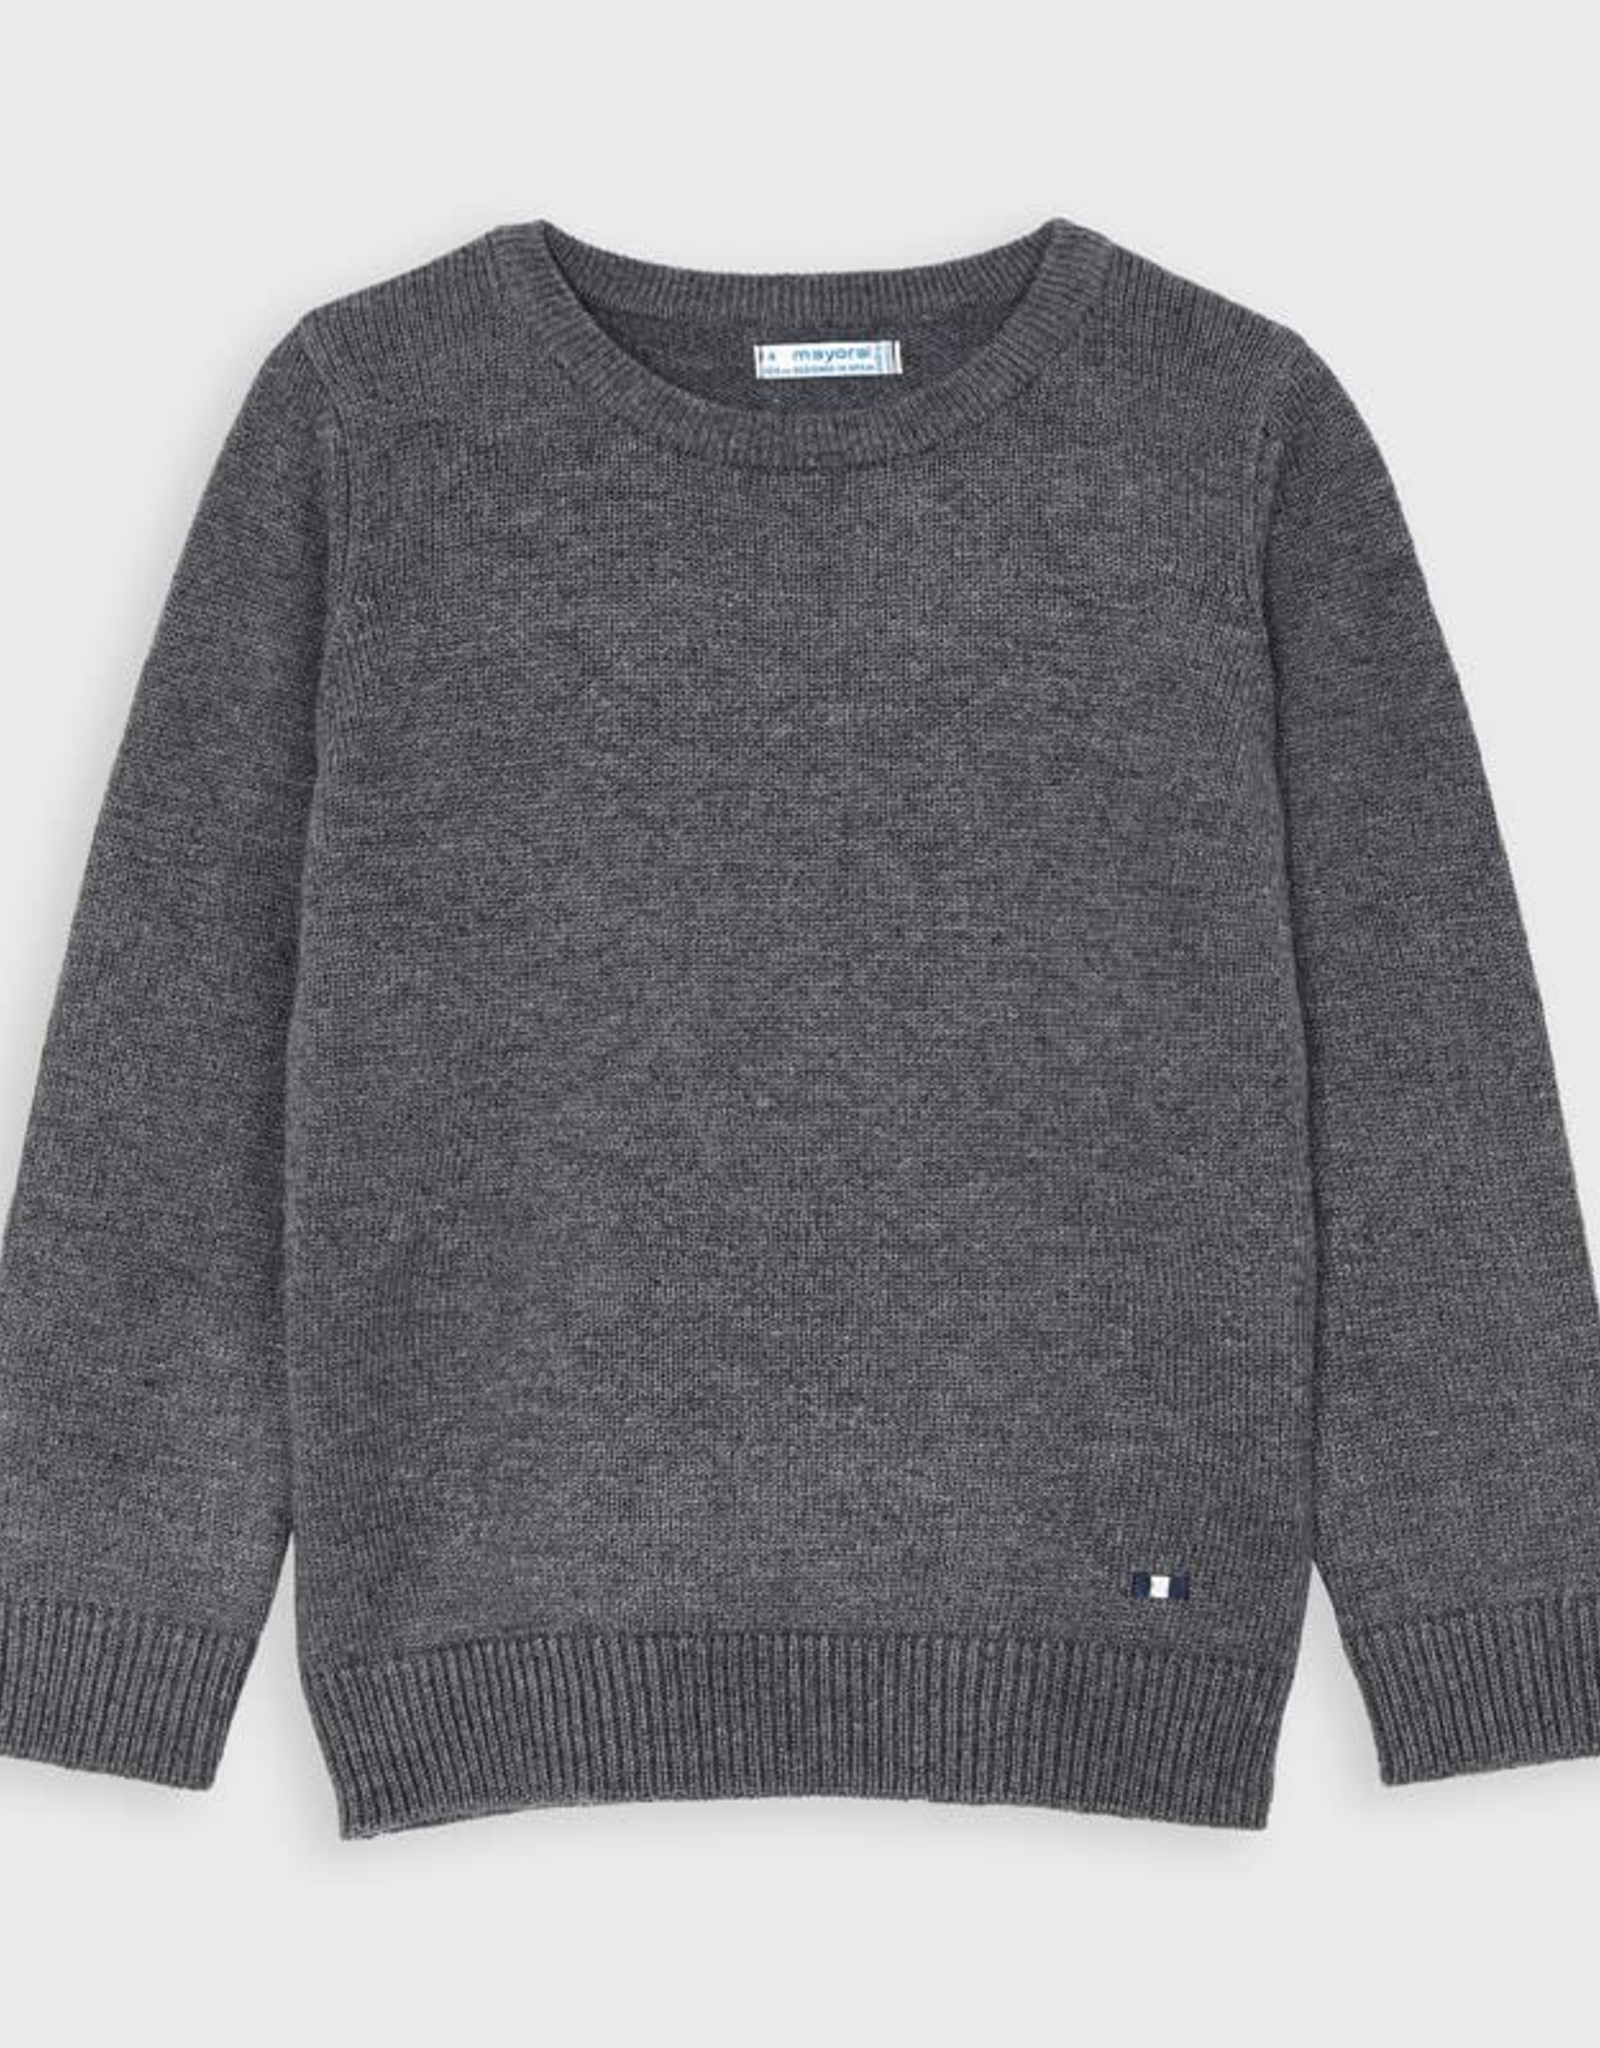 Mayoral Mayoral Basic Cotton Sweater W/ Round Neck